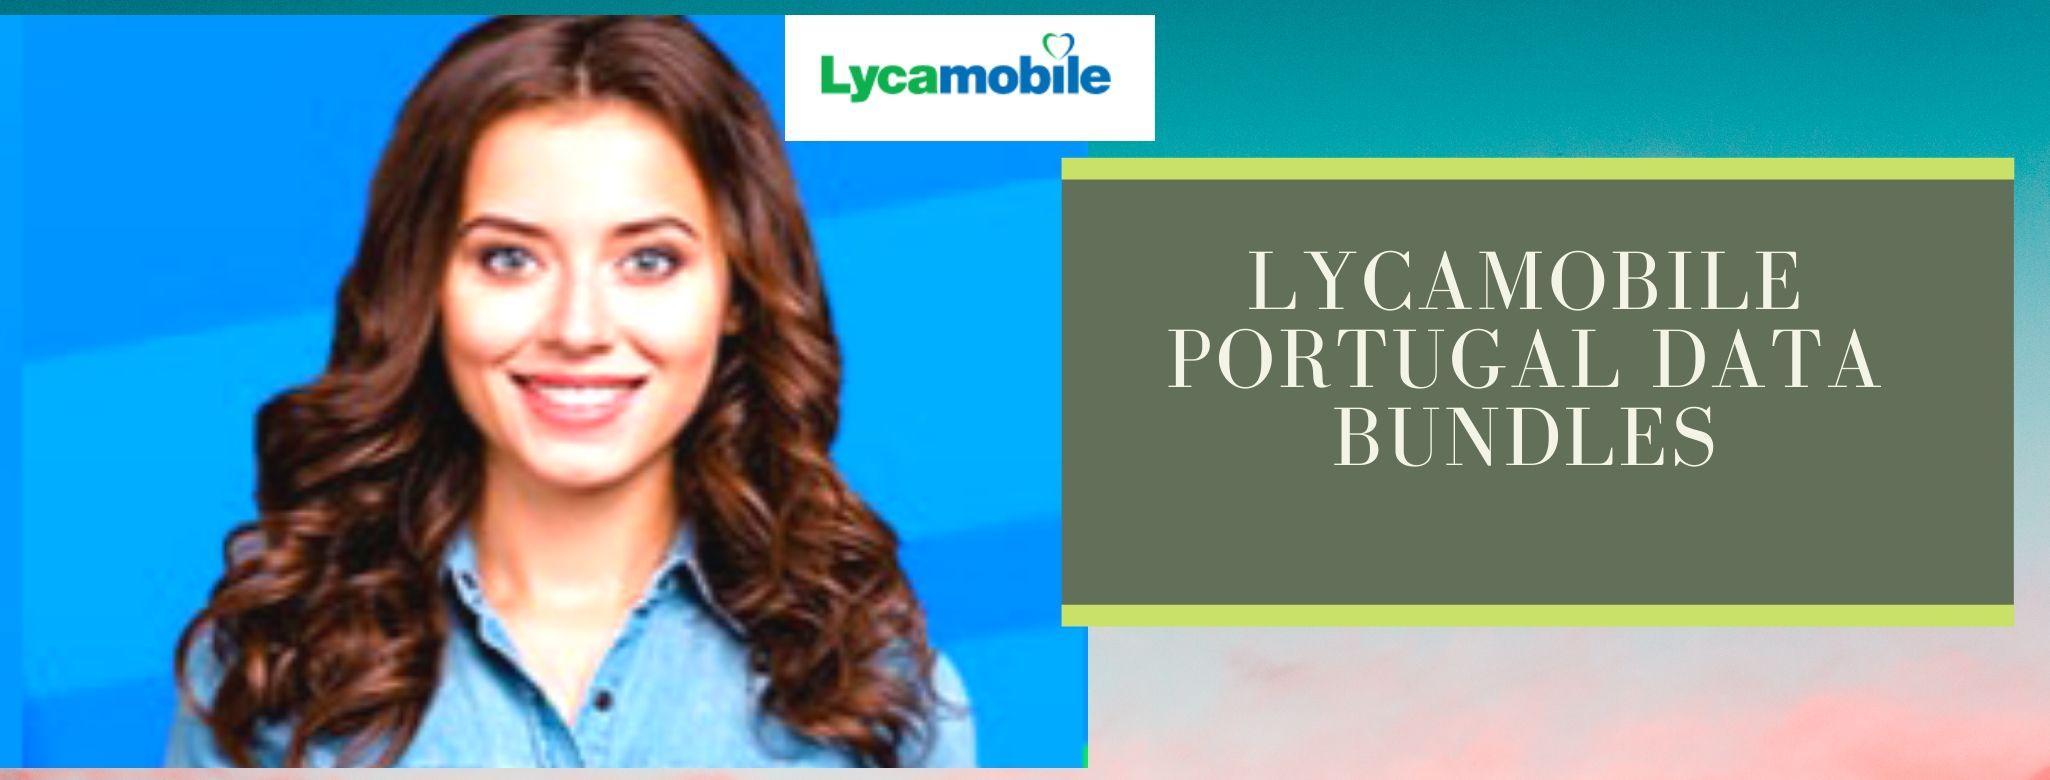 Lyca data plans for Portugal